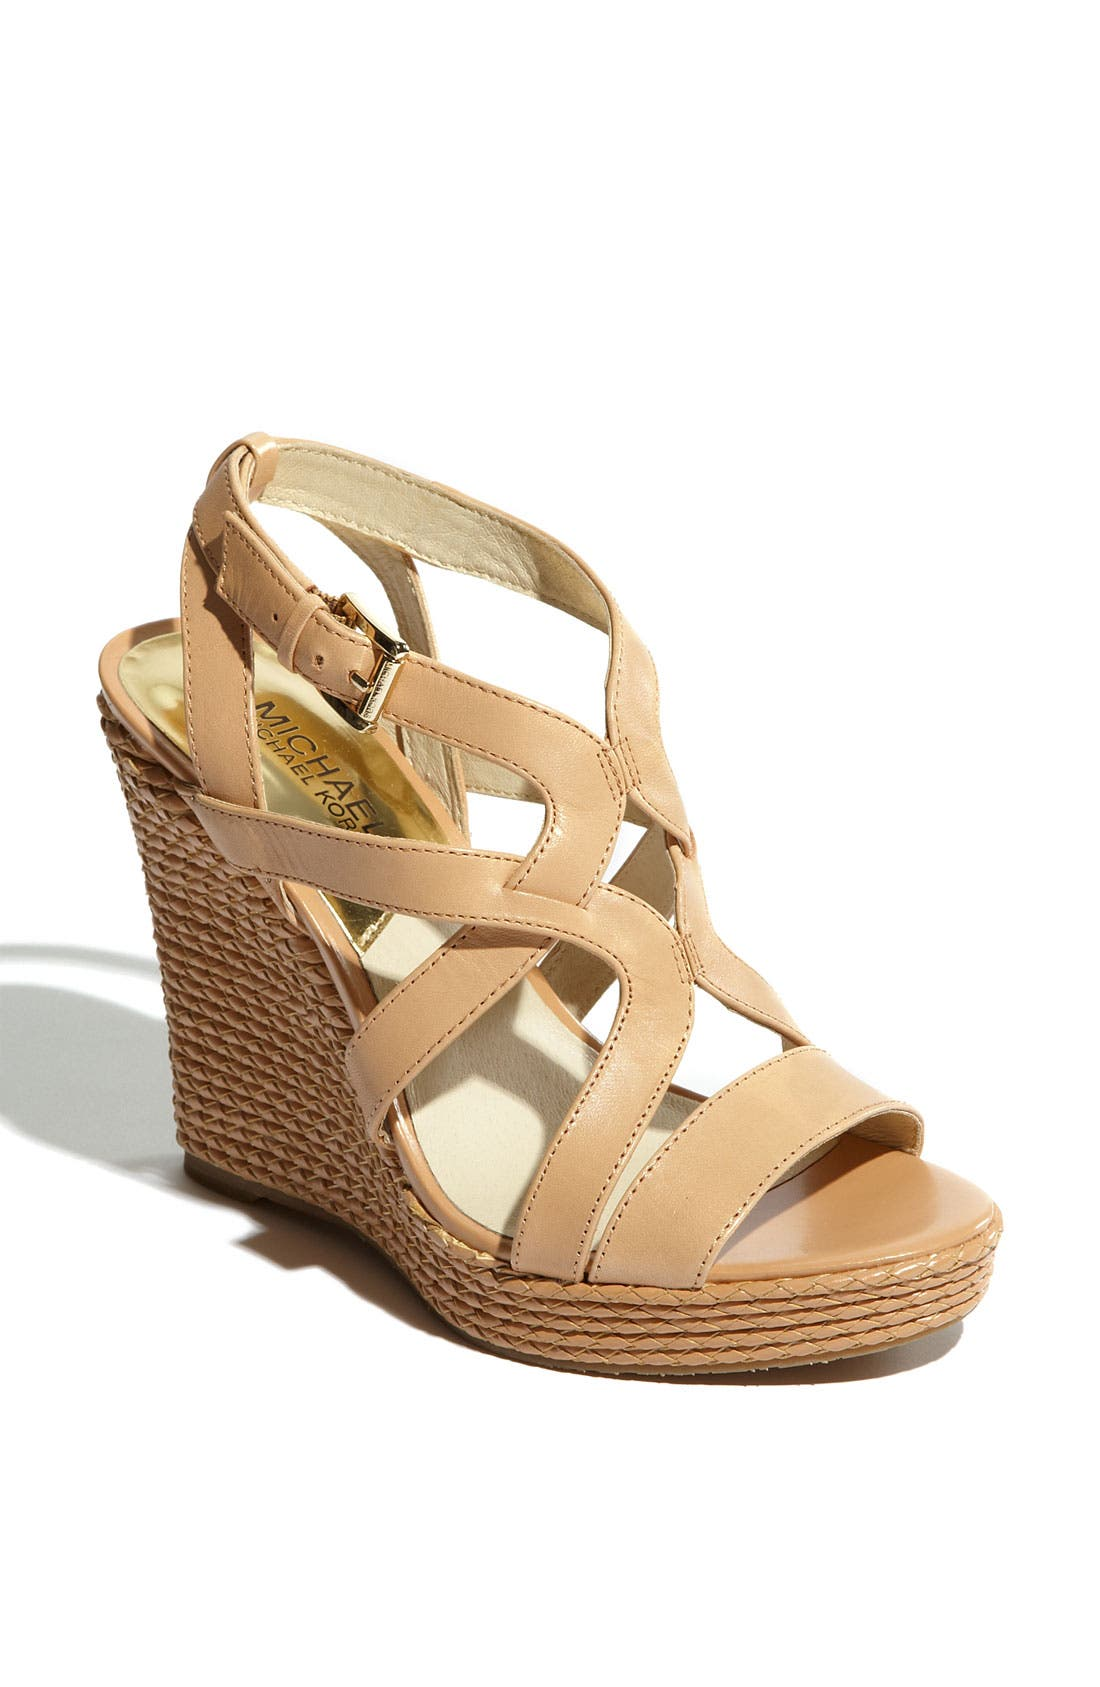 Main Image - MICHAEL Michael Kors 'Palm Desert' Sandal